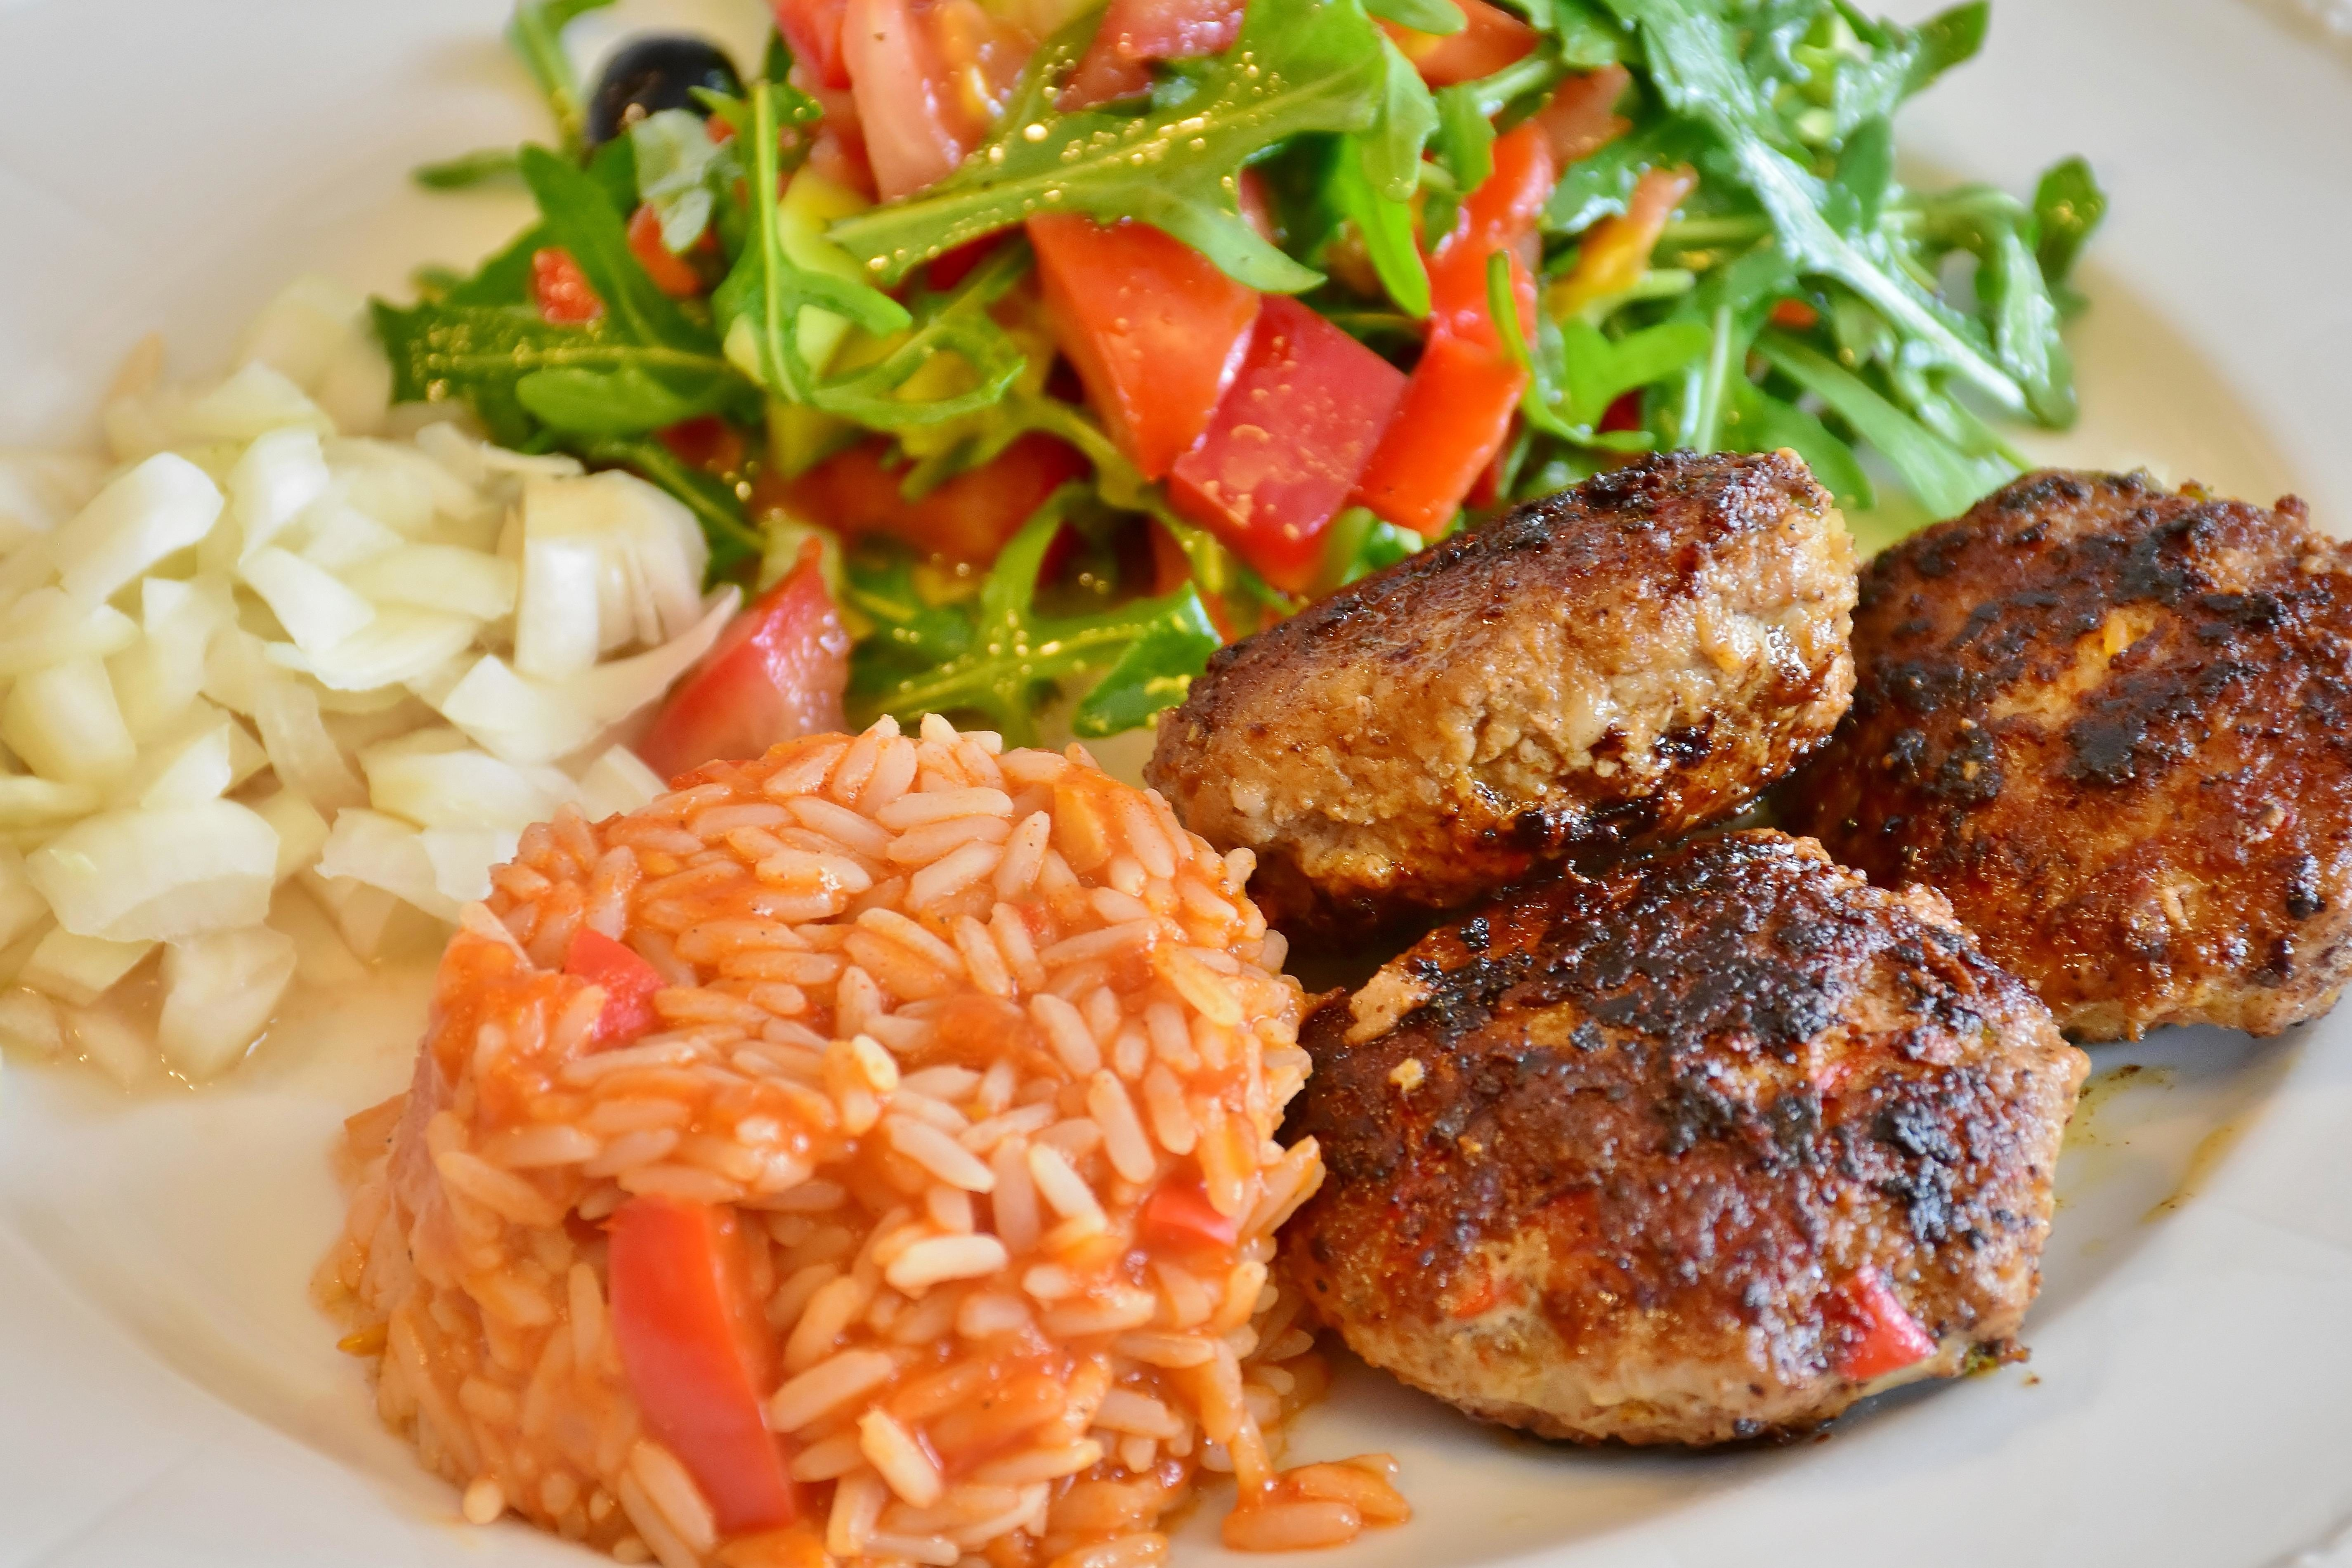 Imagen gratis cena carne comida almuerzo comida